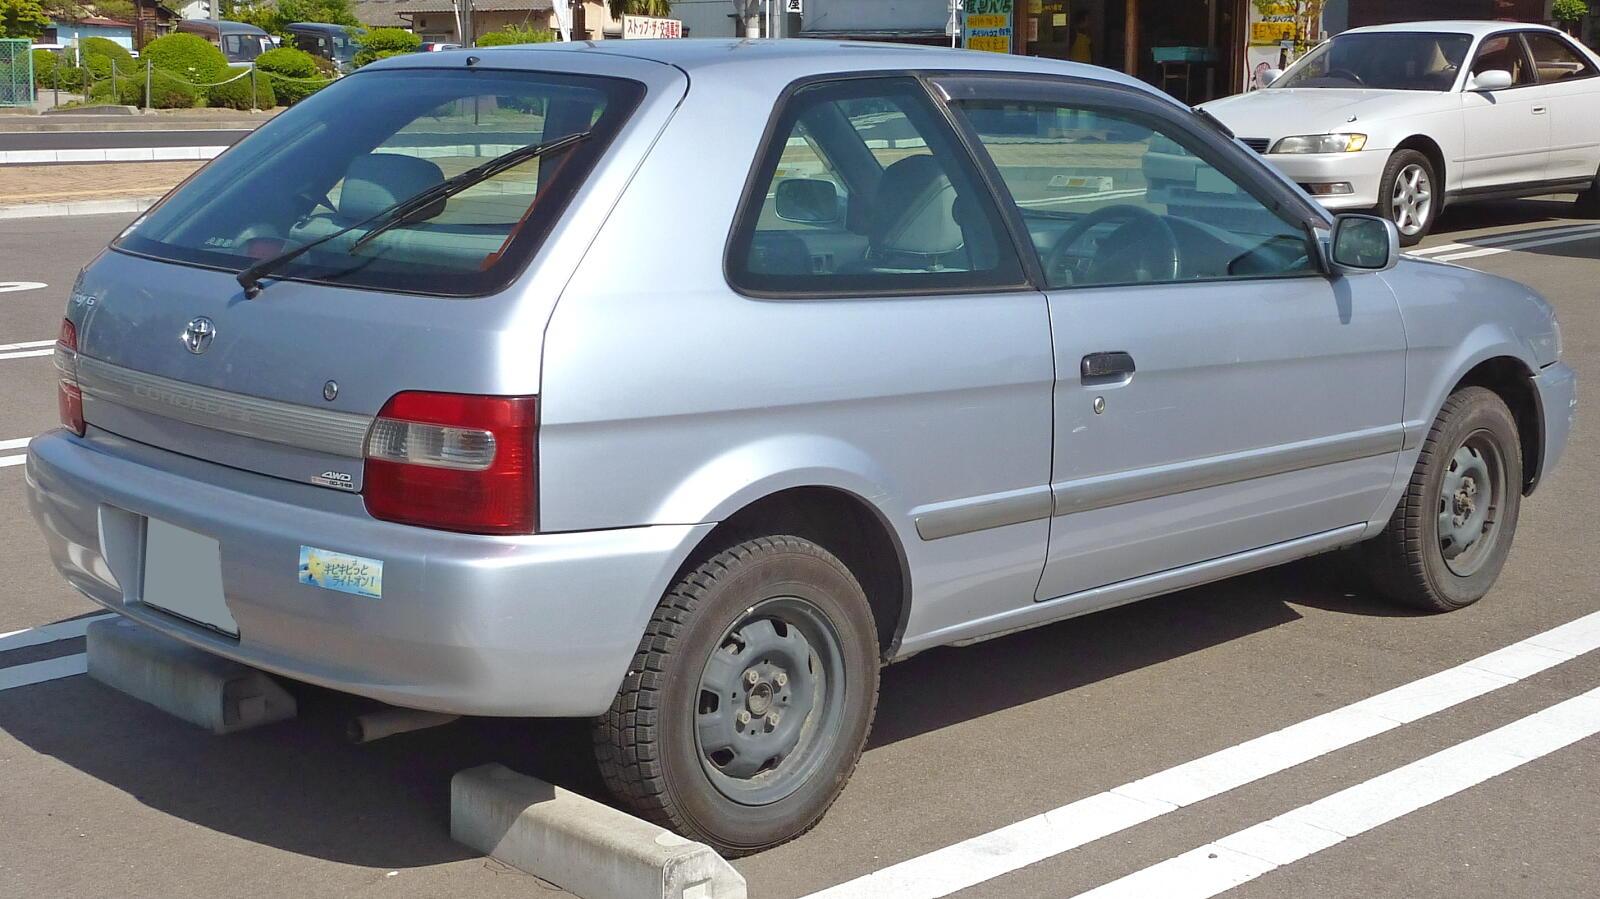 Toyota corsa hatchback 15 i 94 hp resimleri toyota corsa hatchback 15 i 94 hp 6 facelifted japanese market corolla ii 4wd hatchback publicscrutiny Gallery